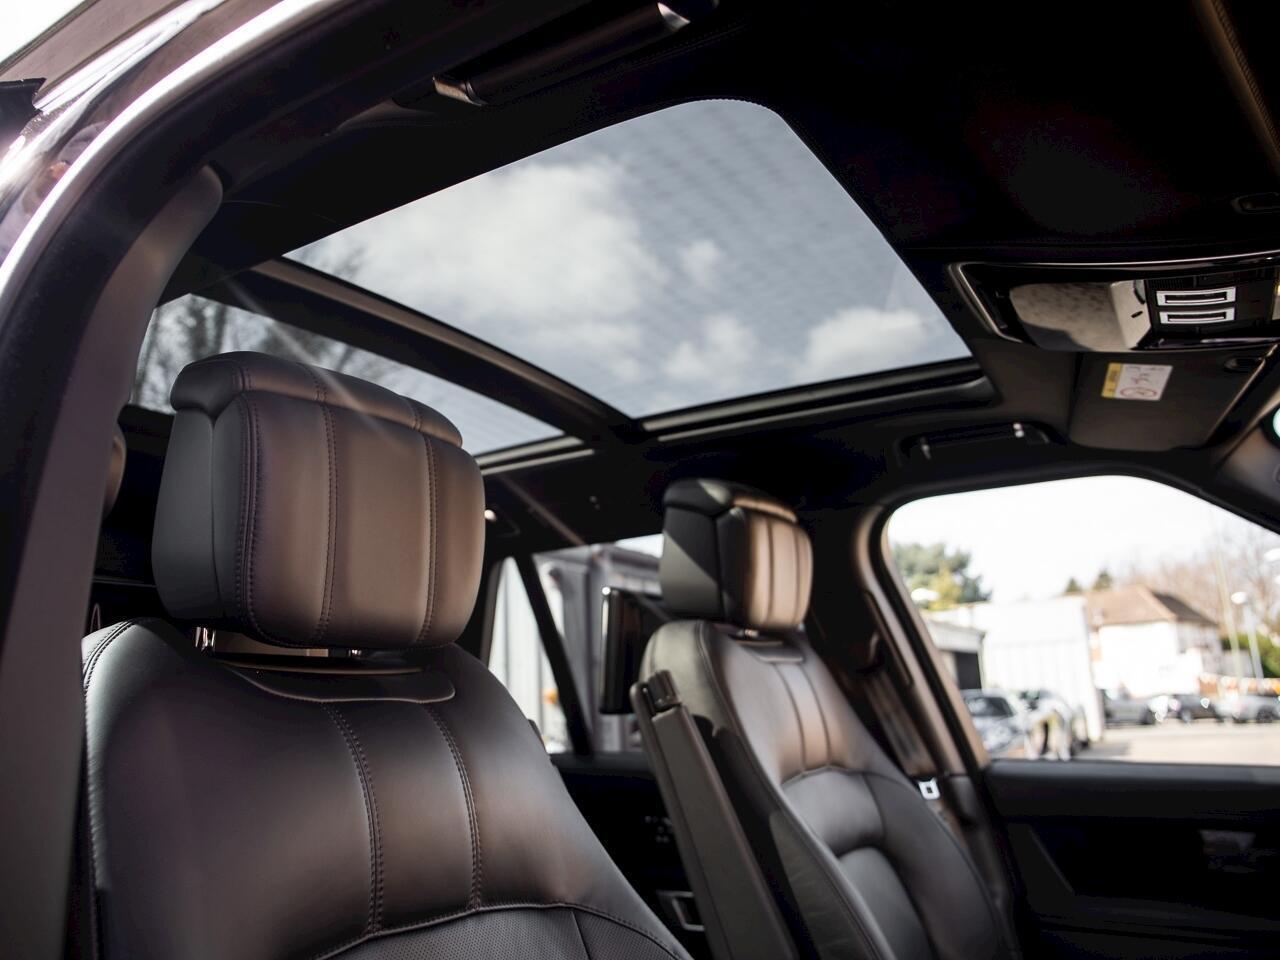 https://cdn.dailyxe.com.vn/image/can-canh-range-rover-autobiography-lwb-black-pack-hon-13-ty-tai-hn-22-67826j2.jpg